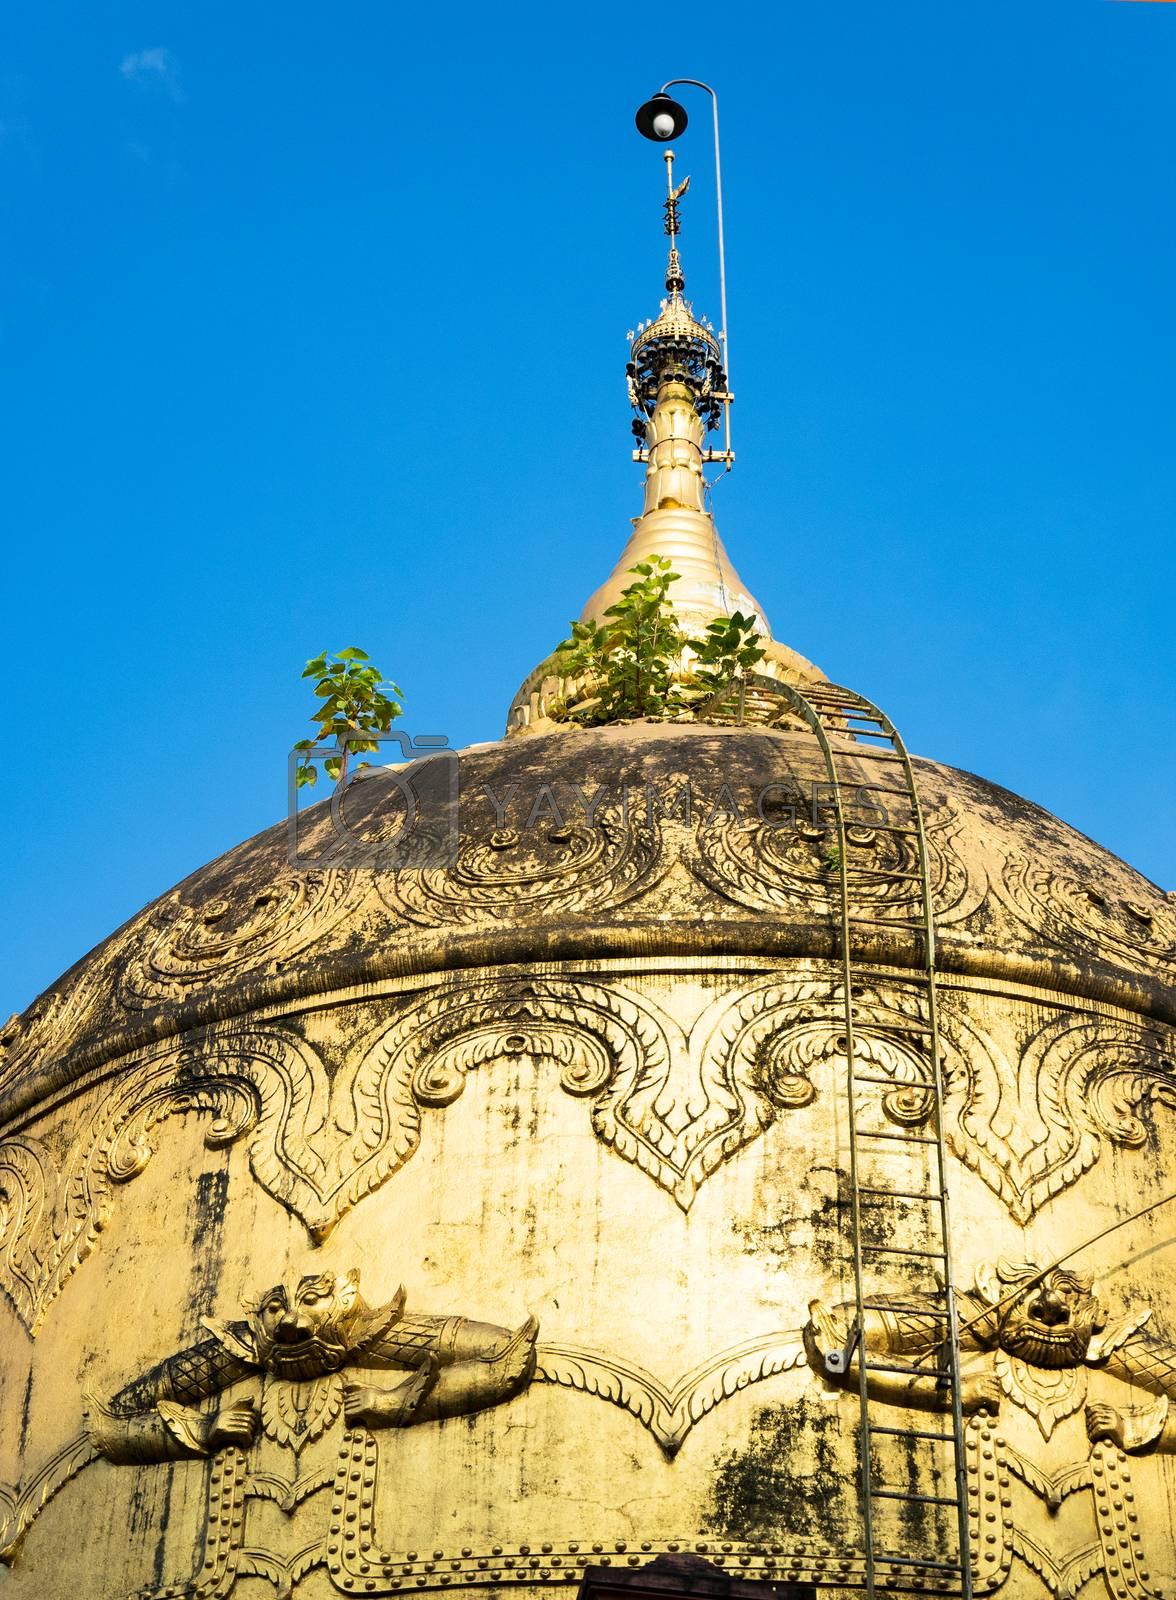 Detail of old pagoda at the Moe Hnying Monastery in Yangon, Myanmar.